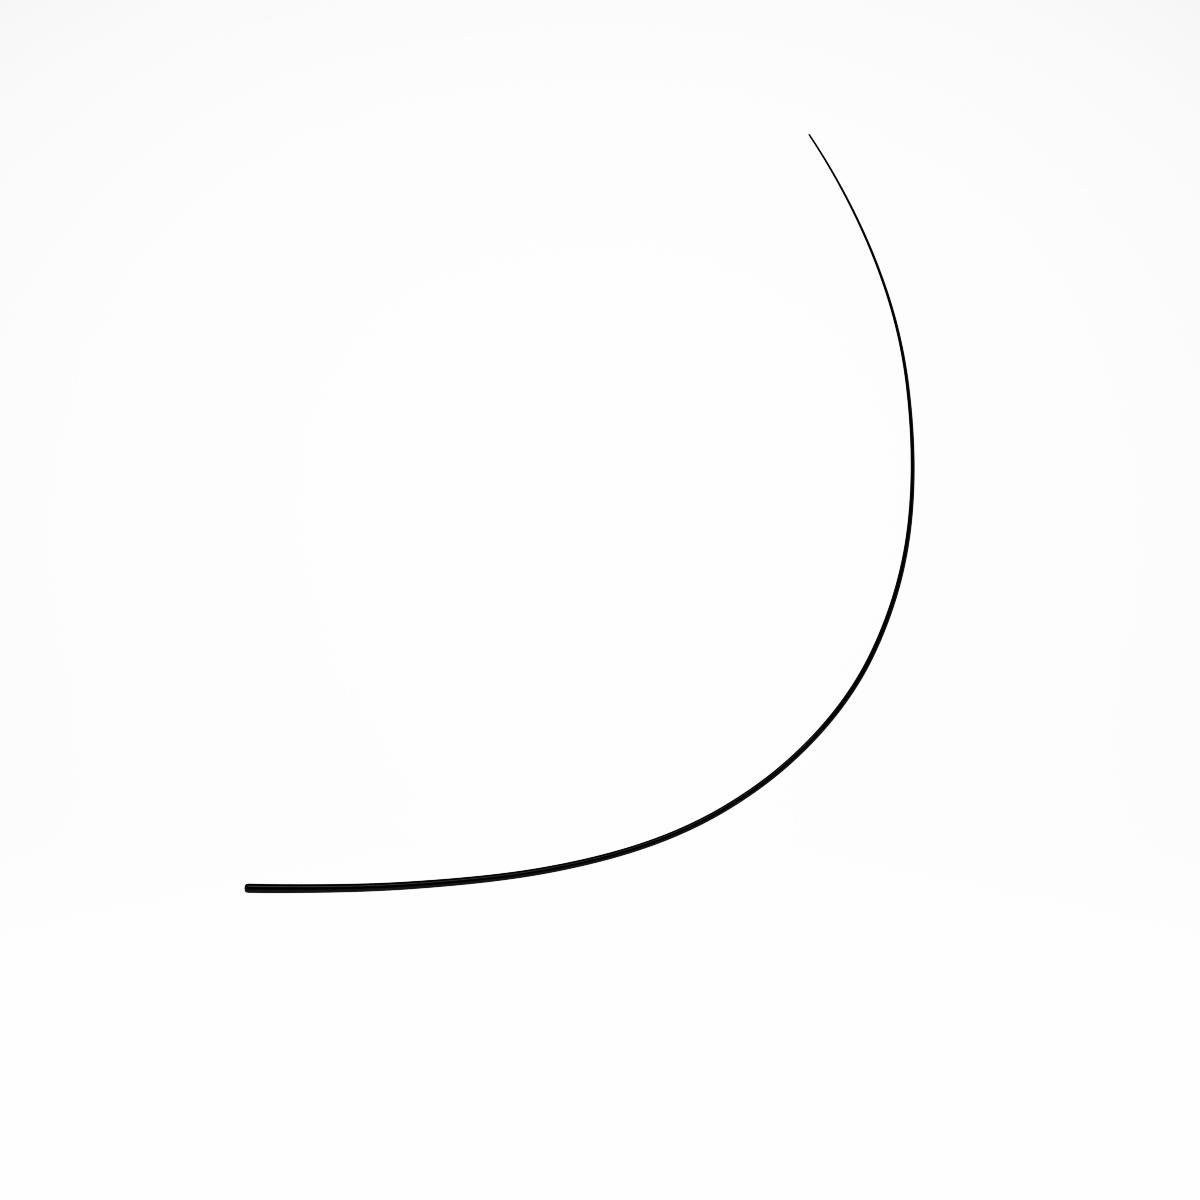 rzesy-objetosciowe-silk-black-d-0-1